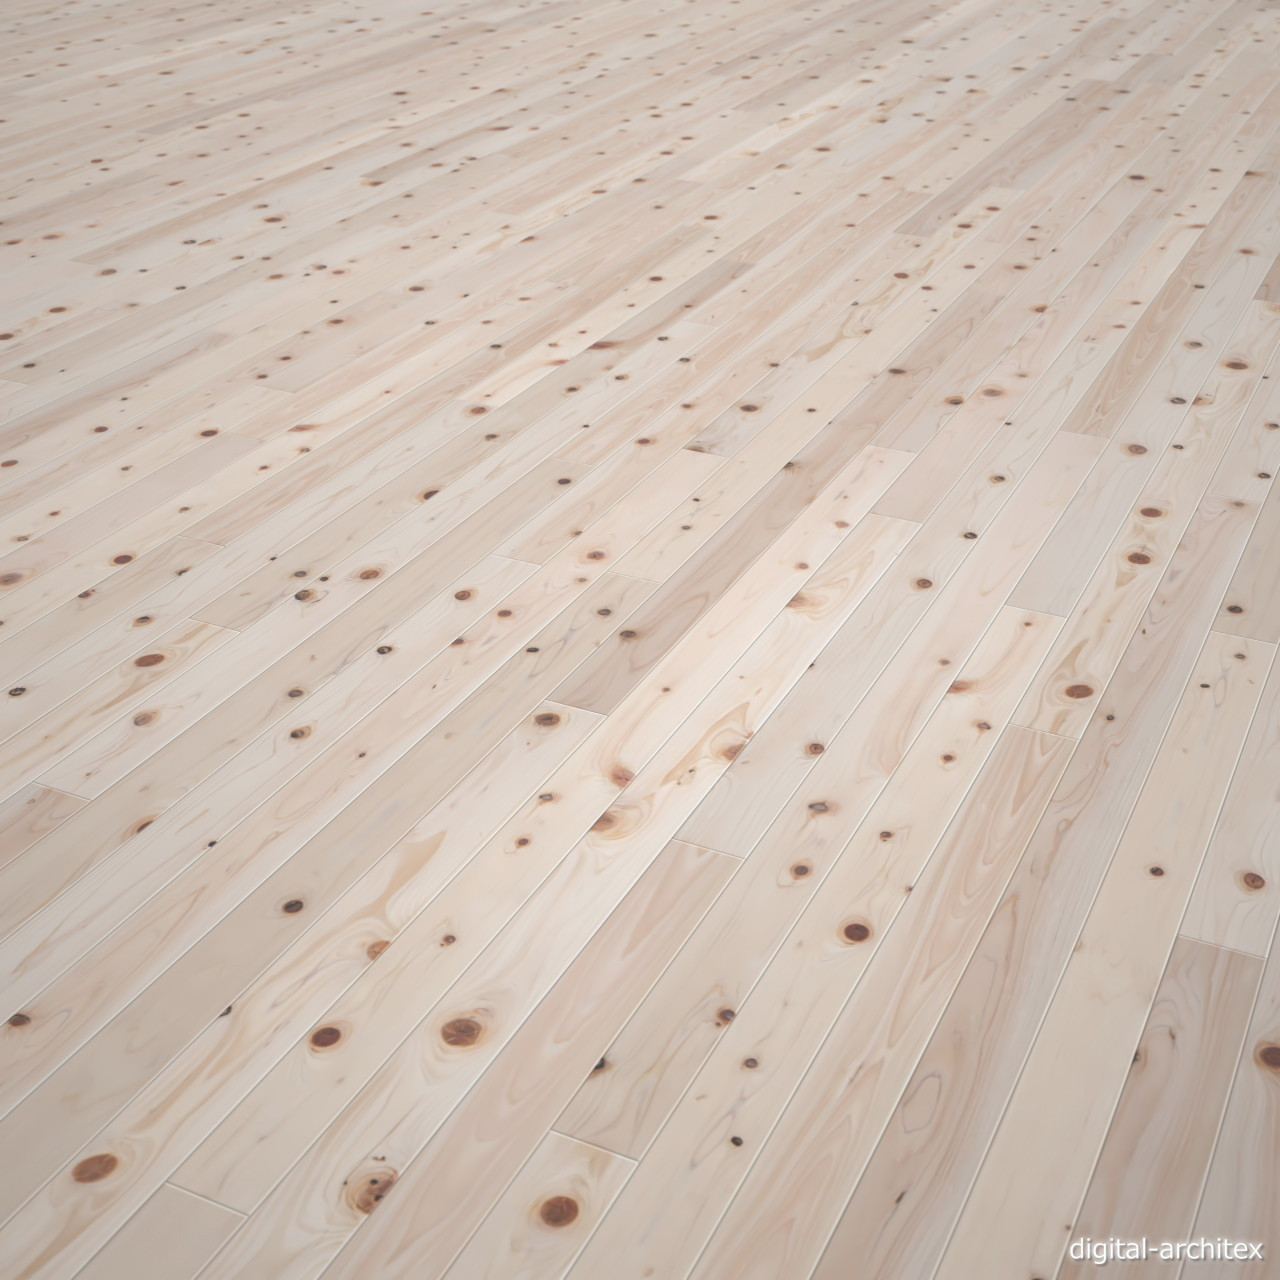 2D,テクスチャー,texture,JPEG,木質,floor,wooden flooring,wood,茶色,brown,桧の乱張り(定尺)のフローリング,木目,節,ひのき,檜,ヒノキ